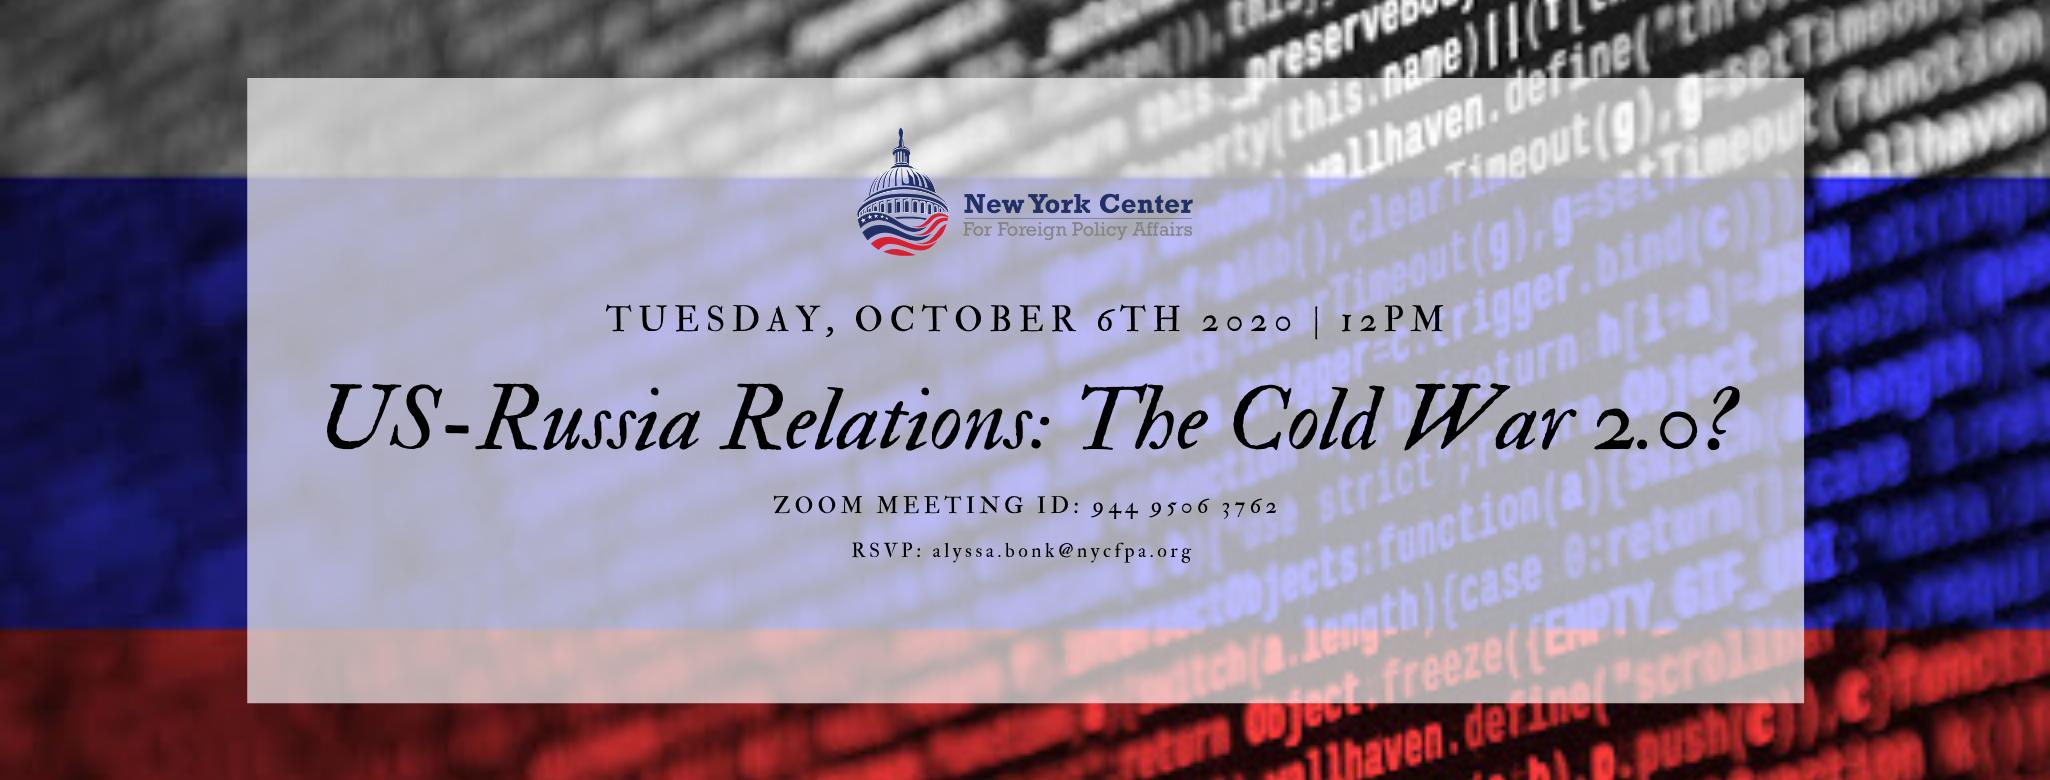 (Postponed) Webinar: US-Russia Relations: The Cold War 2.0?